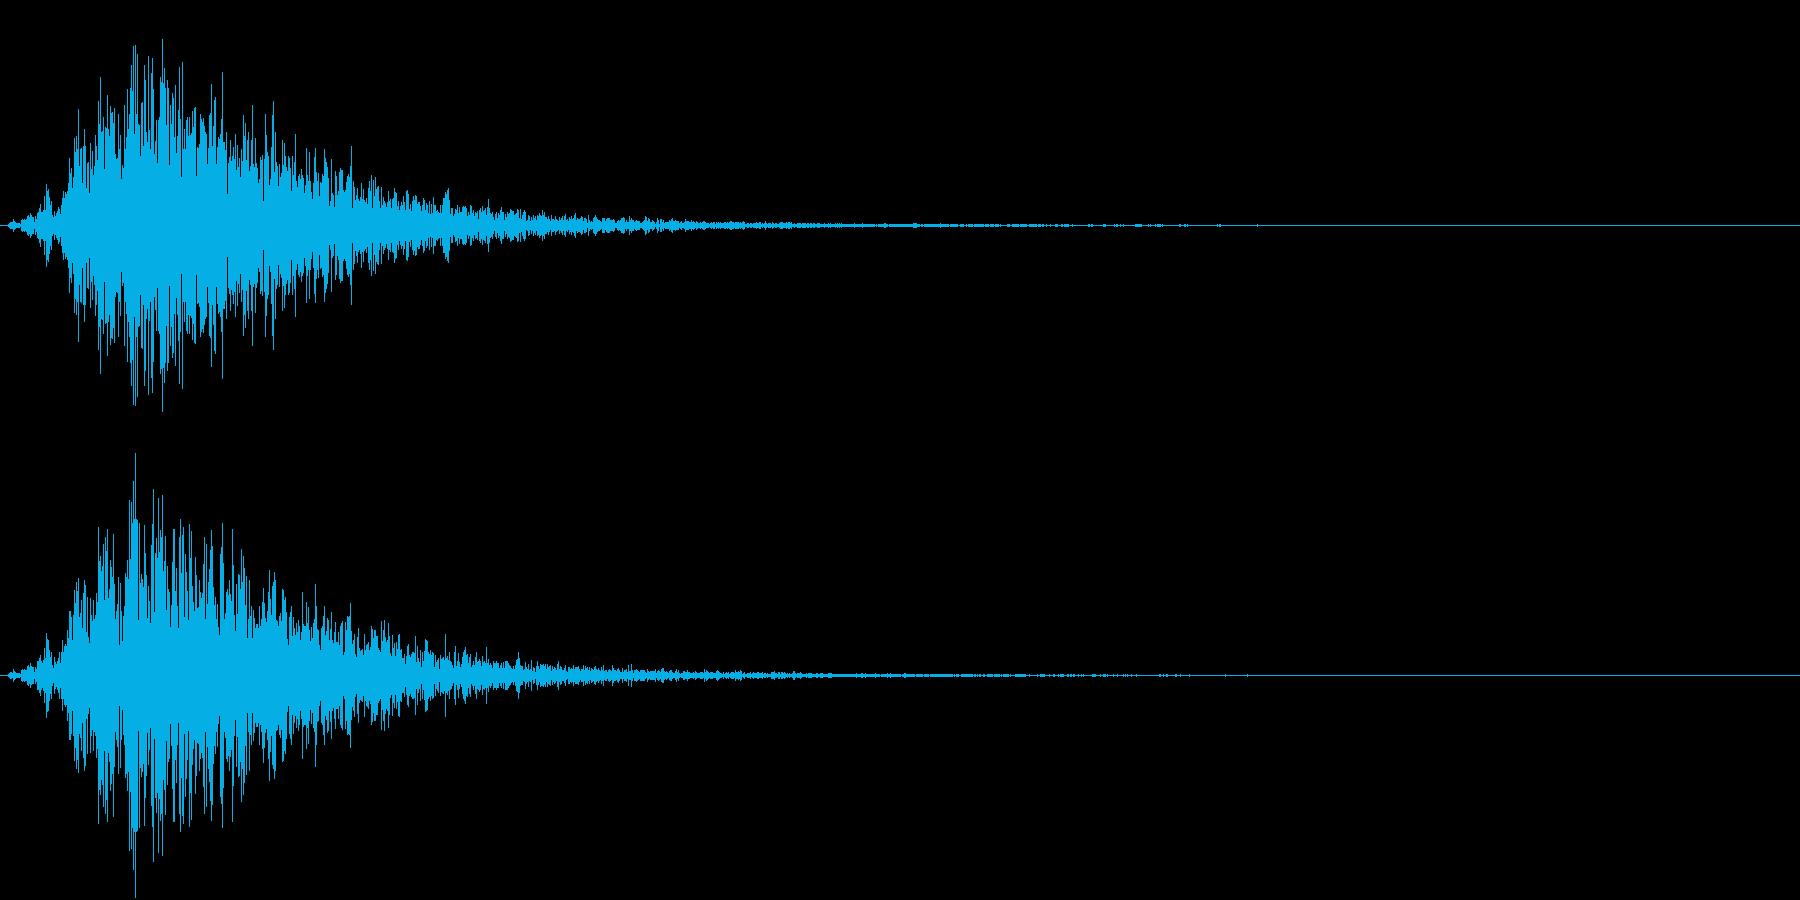 Battle 戦闘エフェクト音 3の再生済みの波形